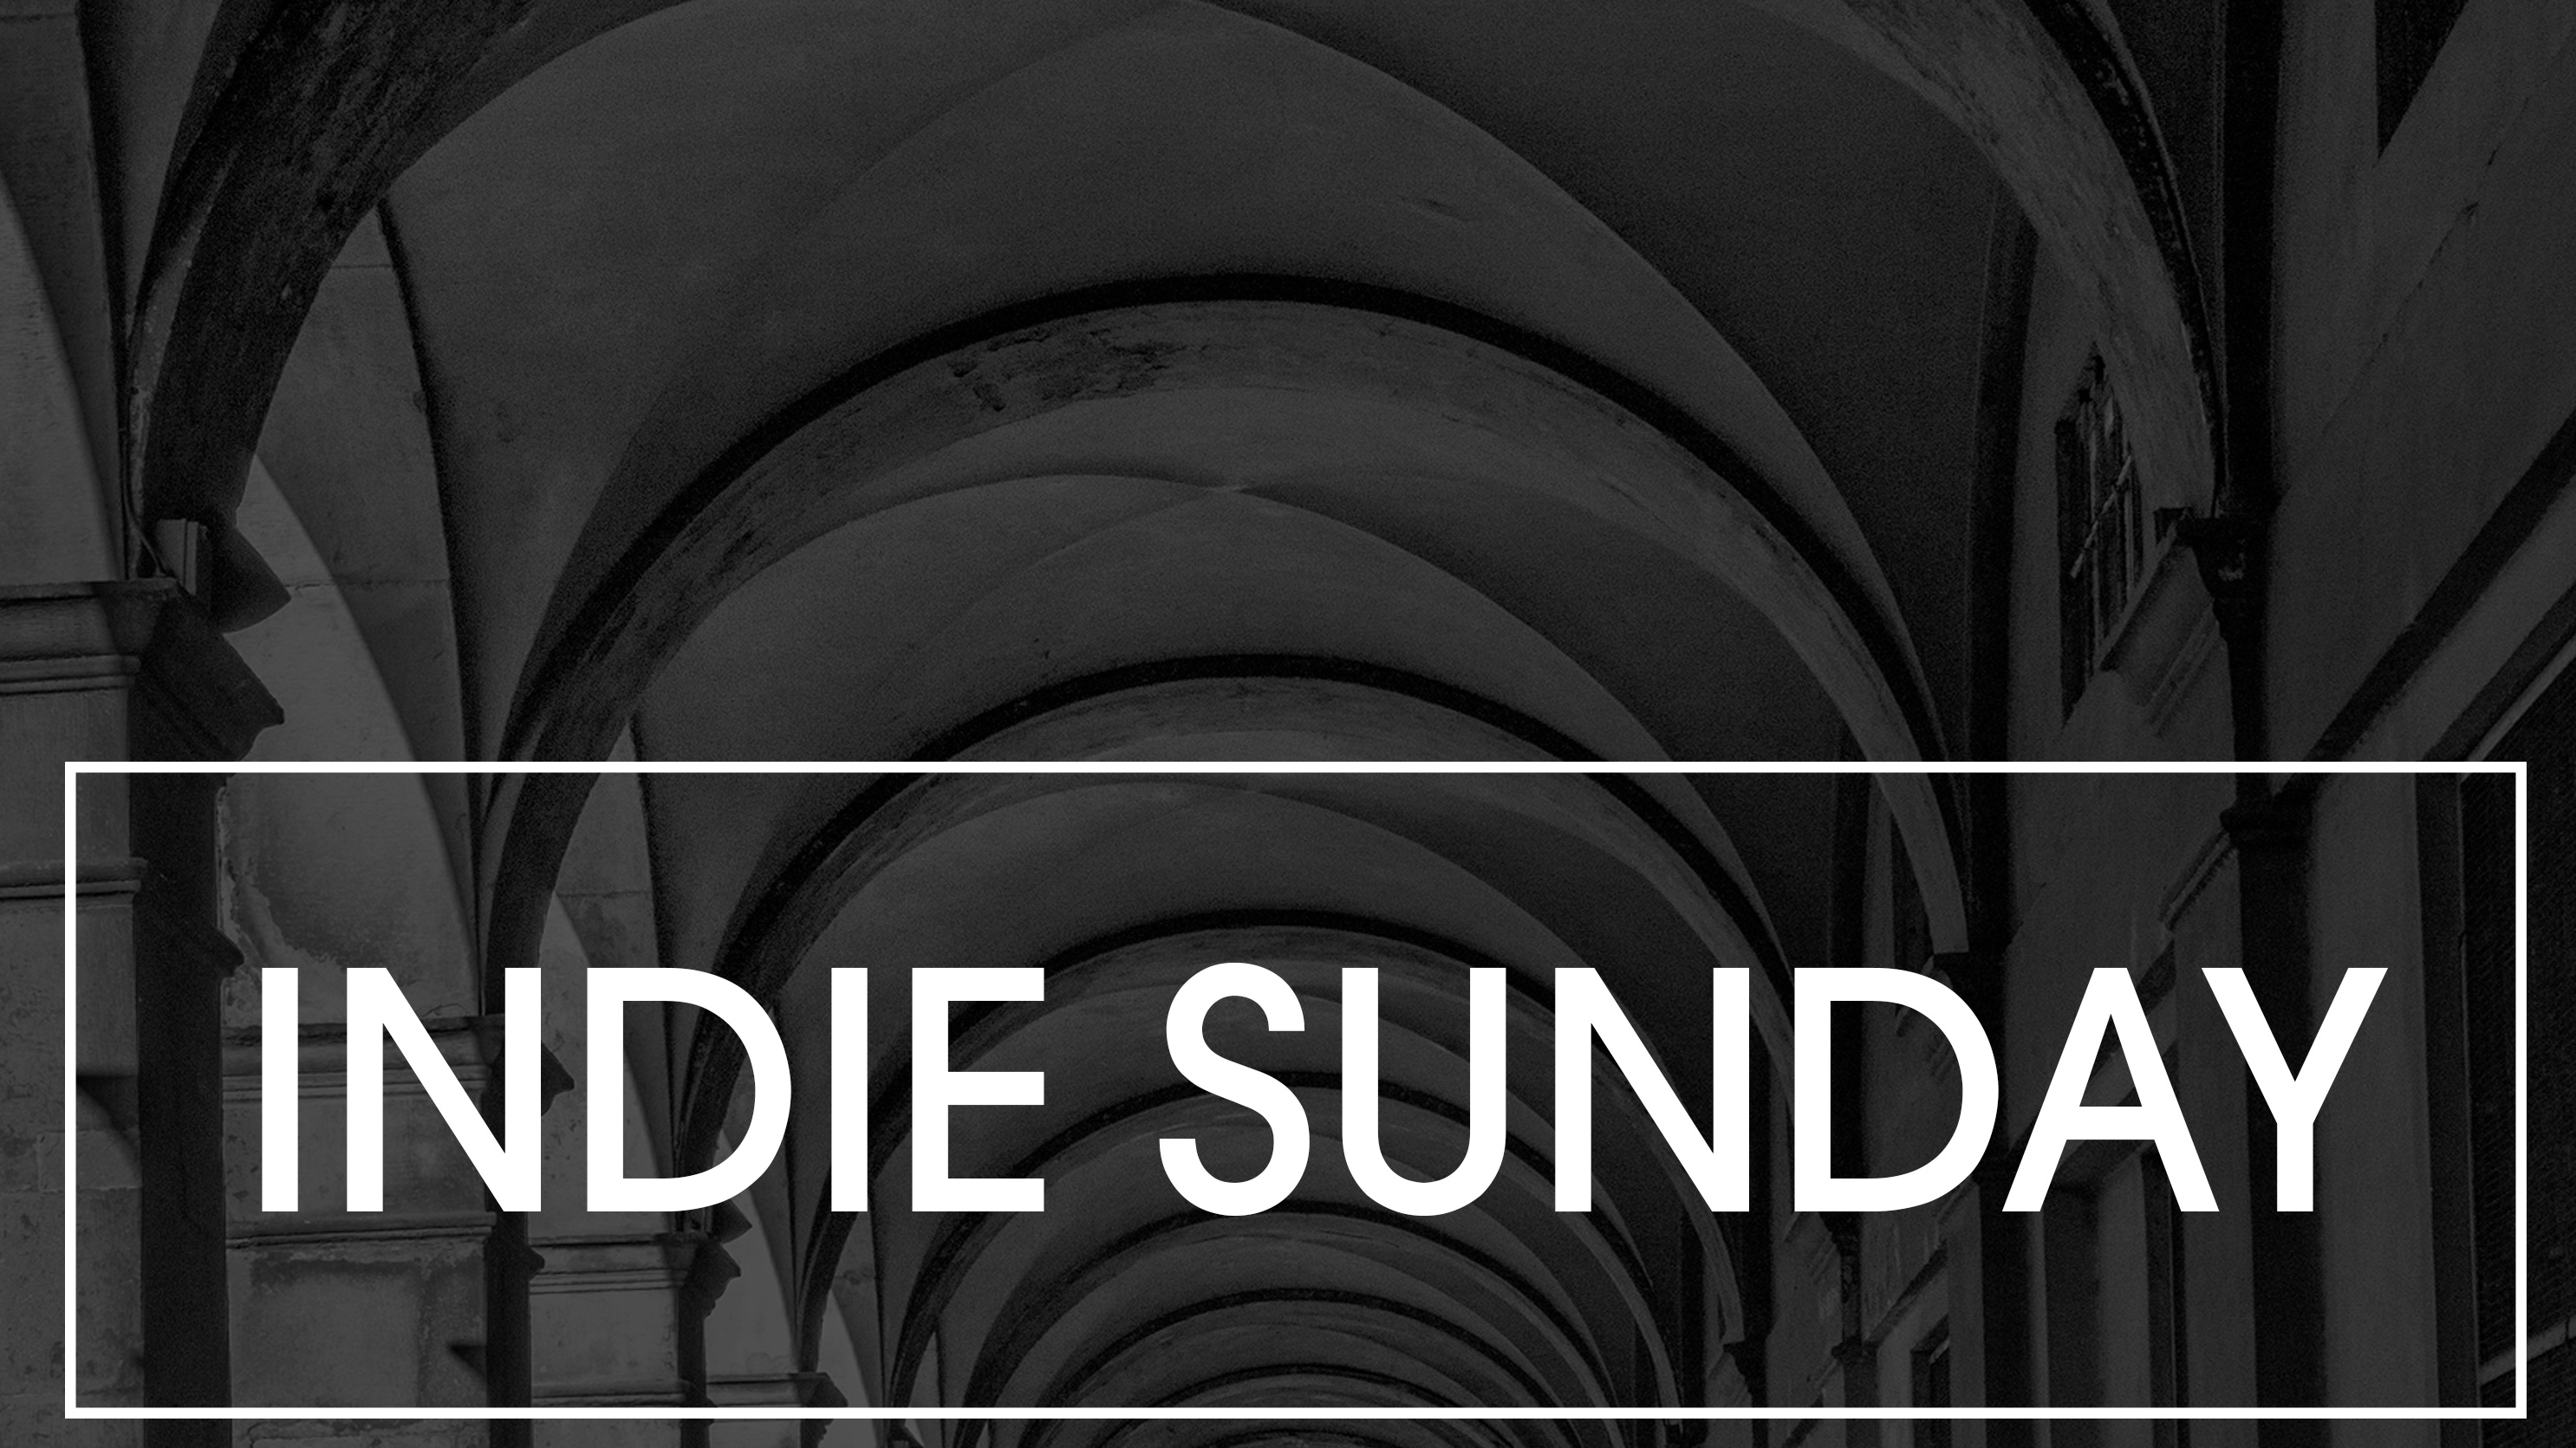 Indie Sunday